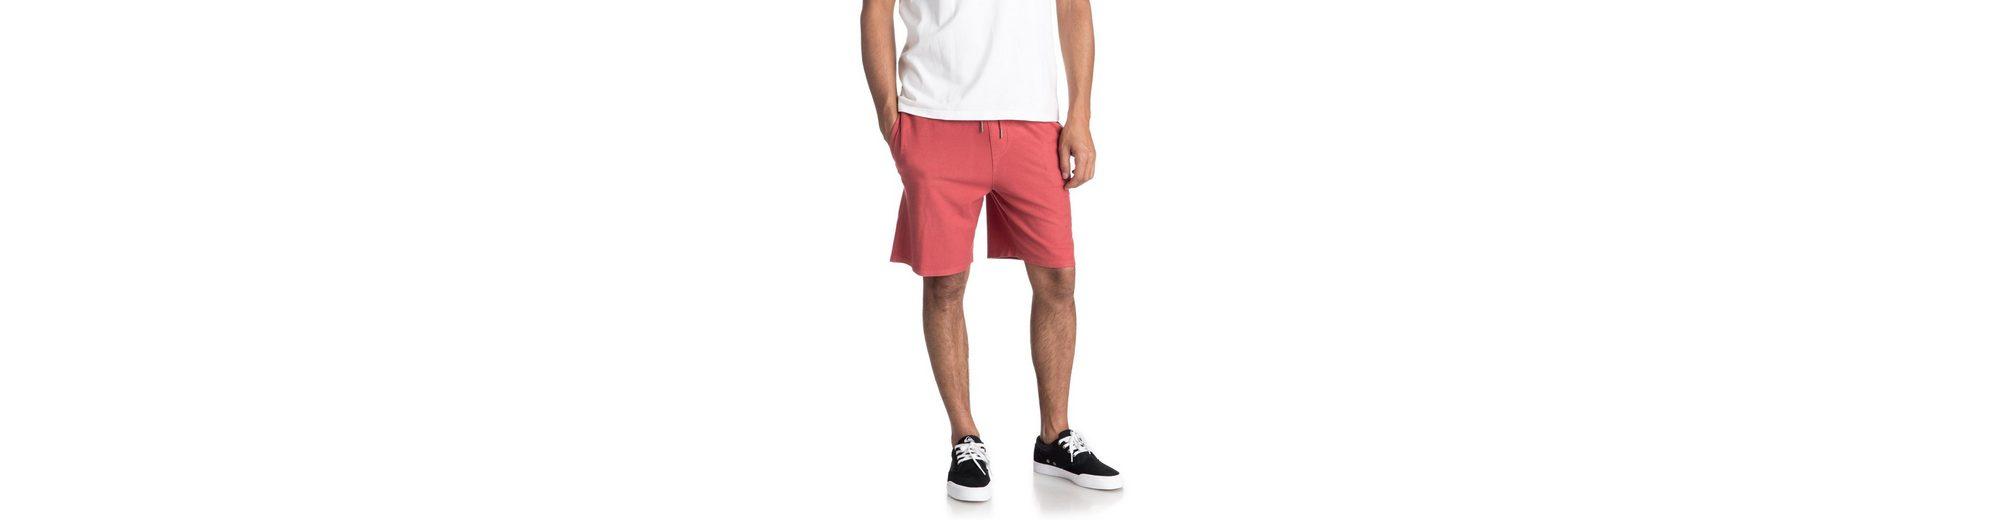 Quiksilver Sweat Shorts Baao Bester Großhandelsverkauf Online Modisch Rf3iM8Fpu